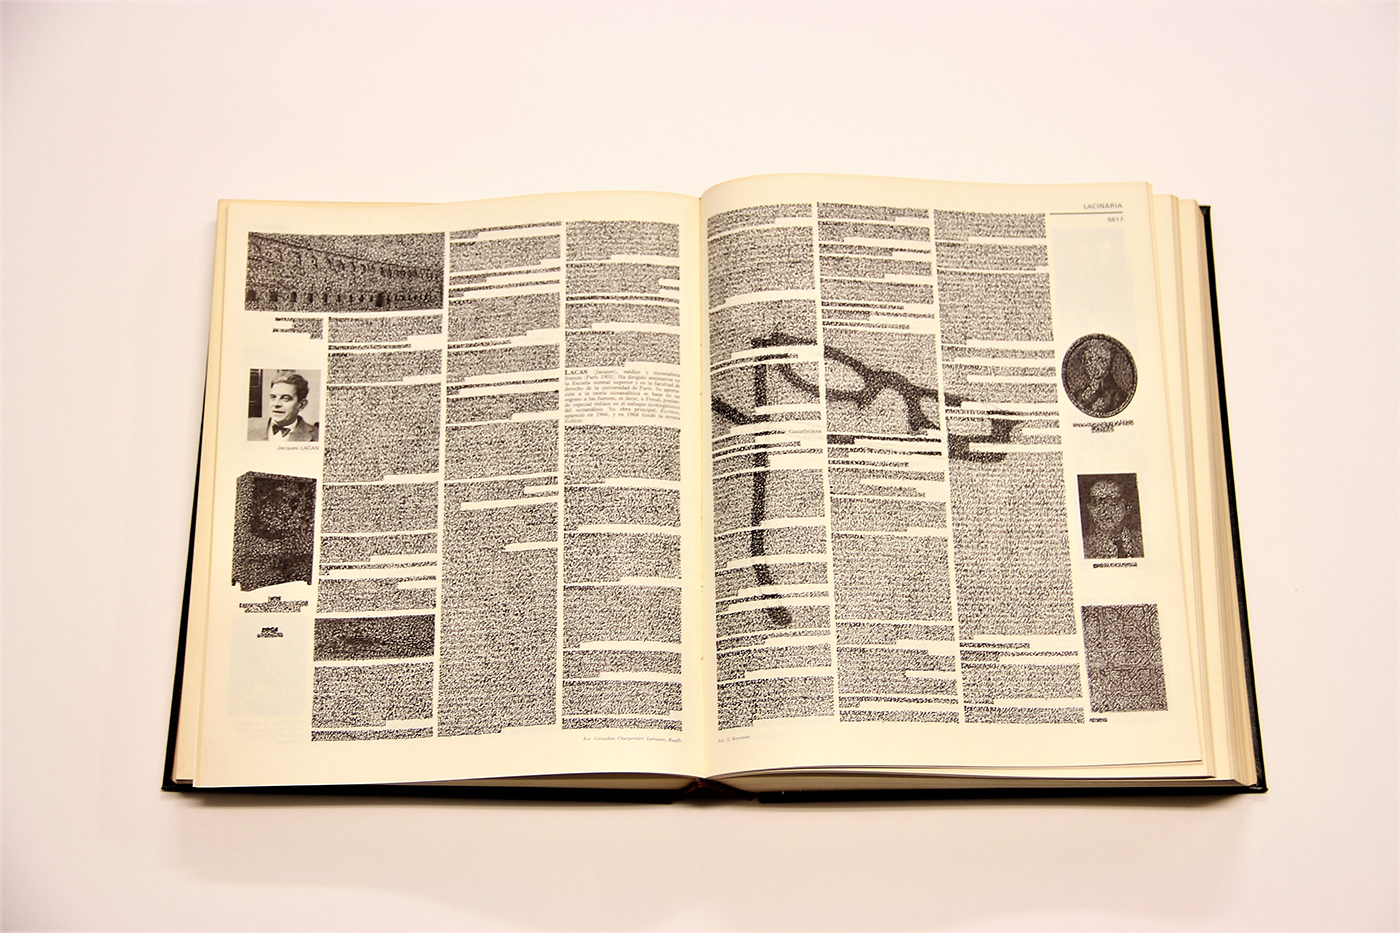 Gonzalo-Elvira-Lacan-2017-Tinta-sobre-enciclopedia-35-x-50-cm